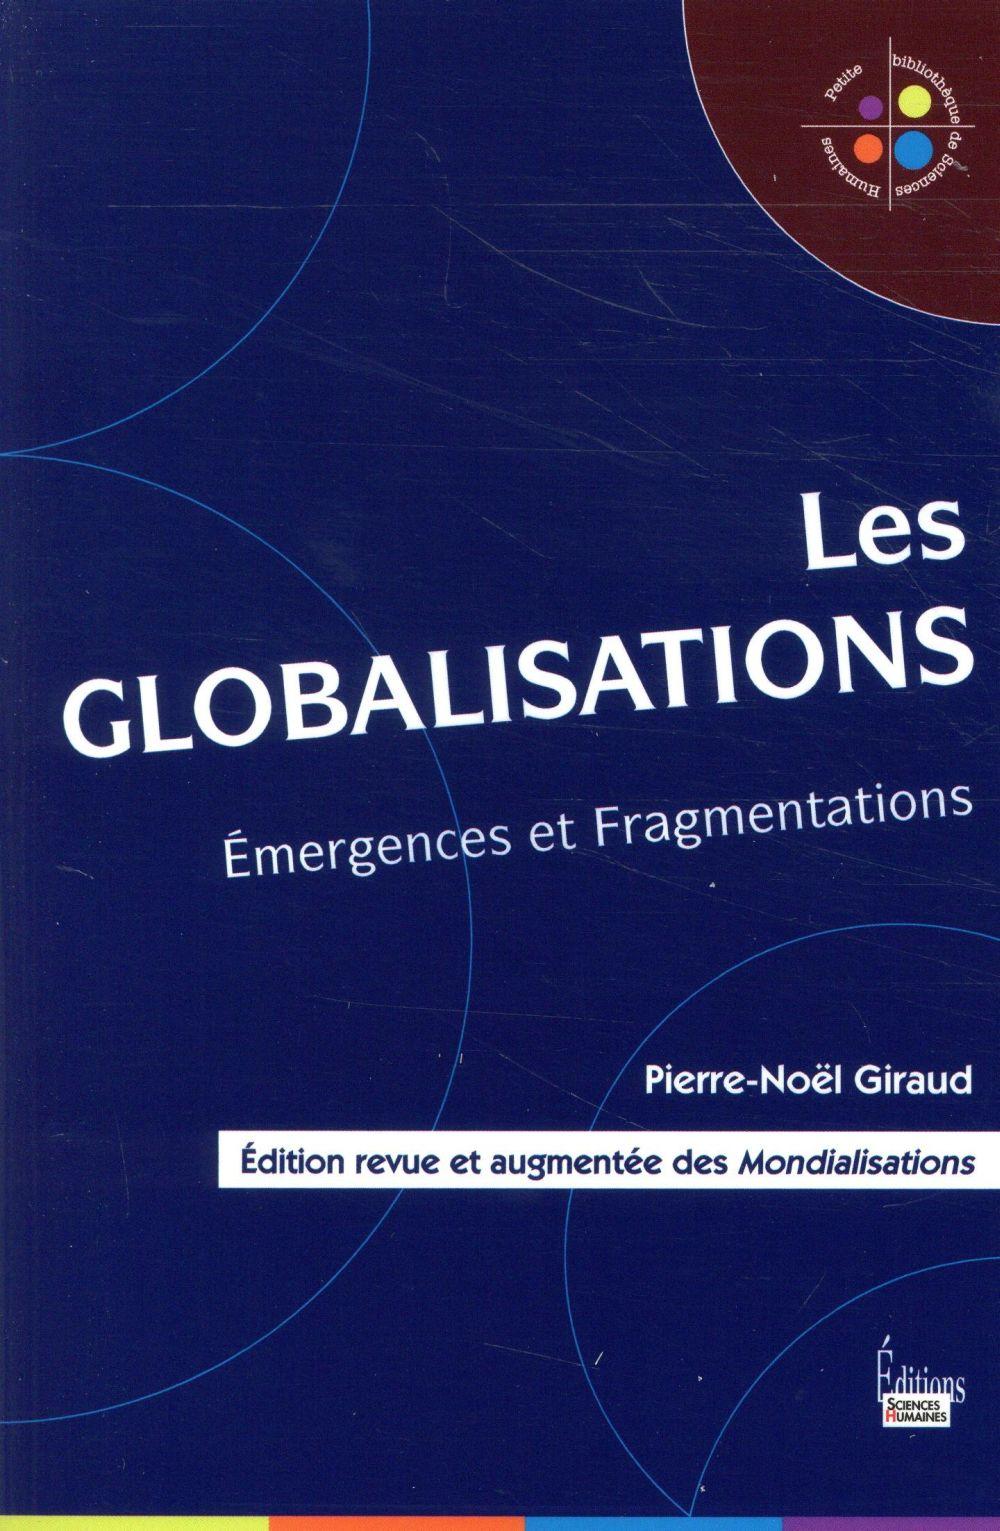 Les globalisations ; émergences et fragmentations